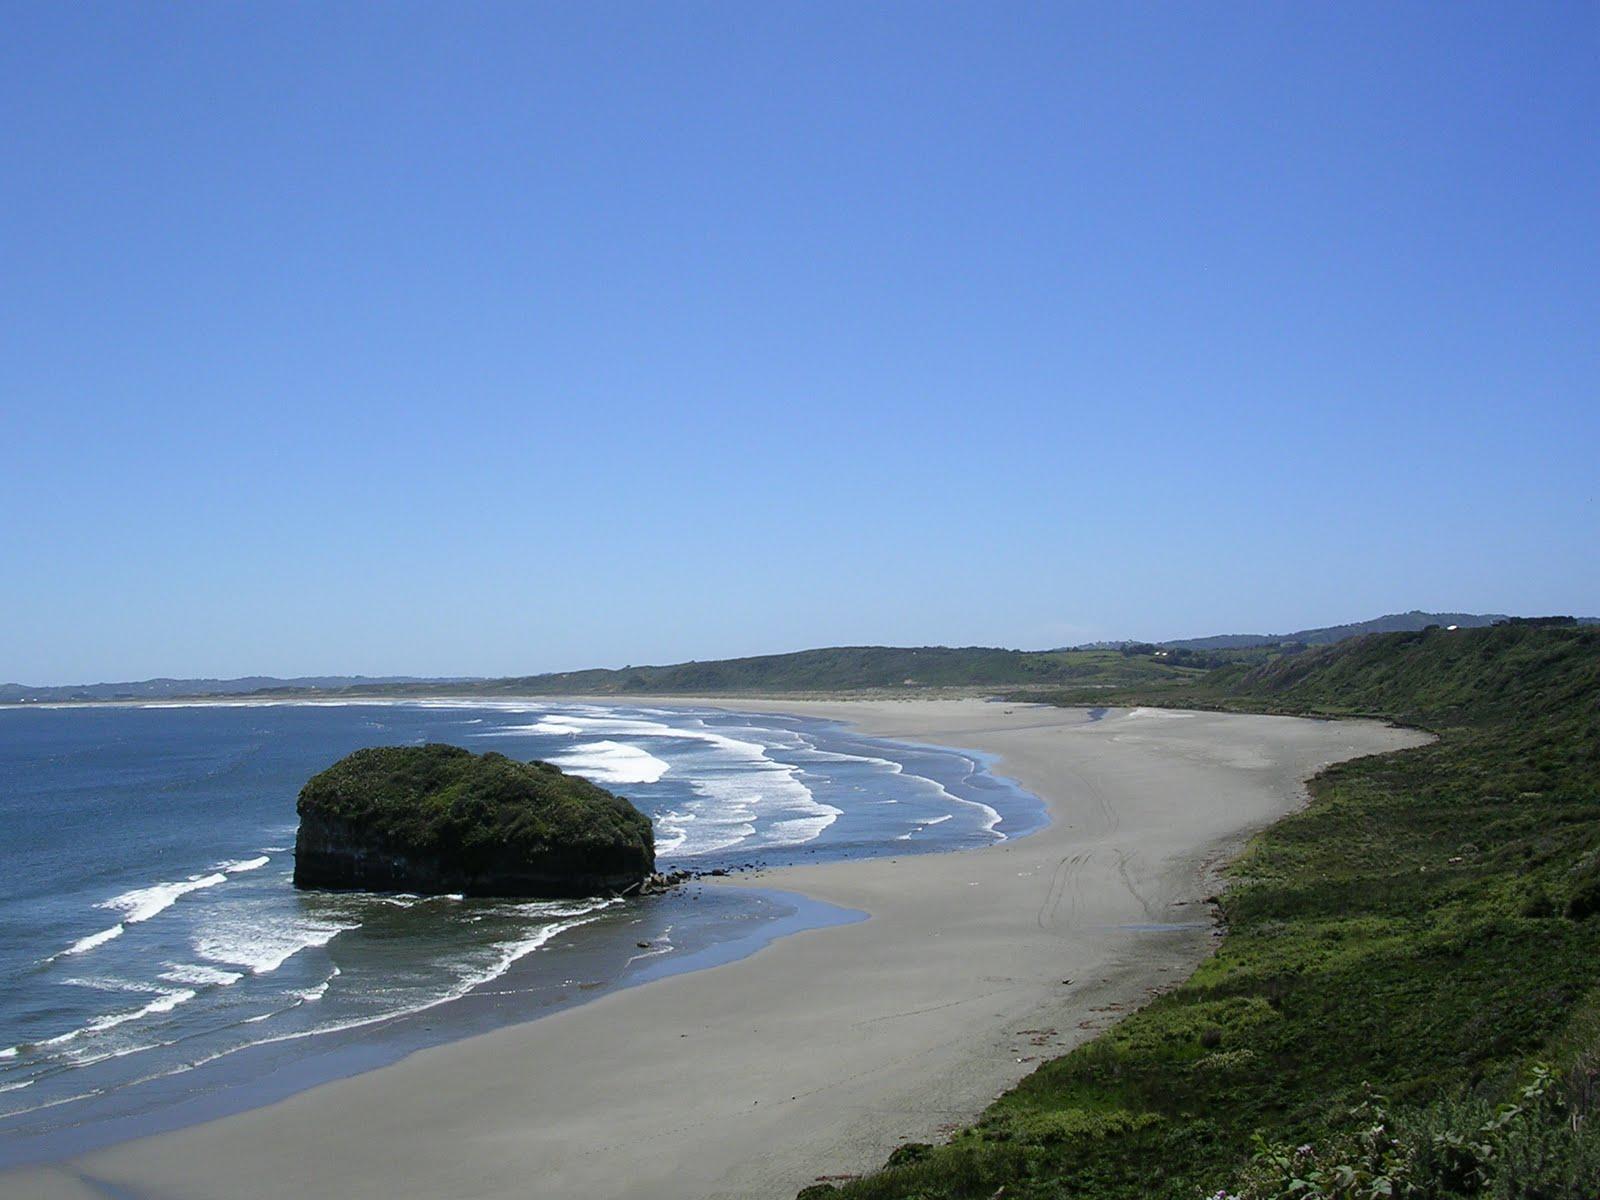 [coast]